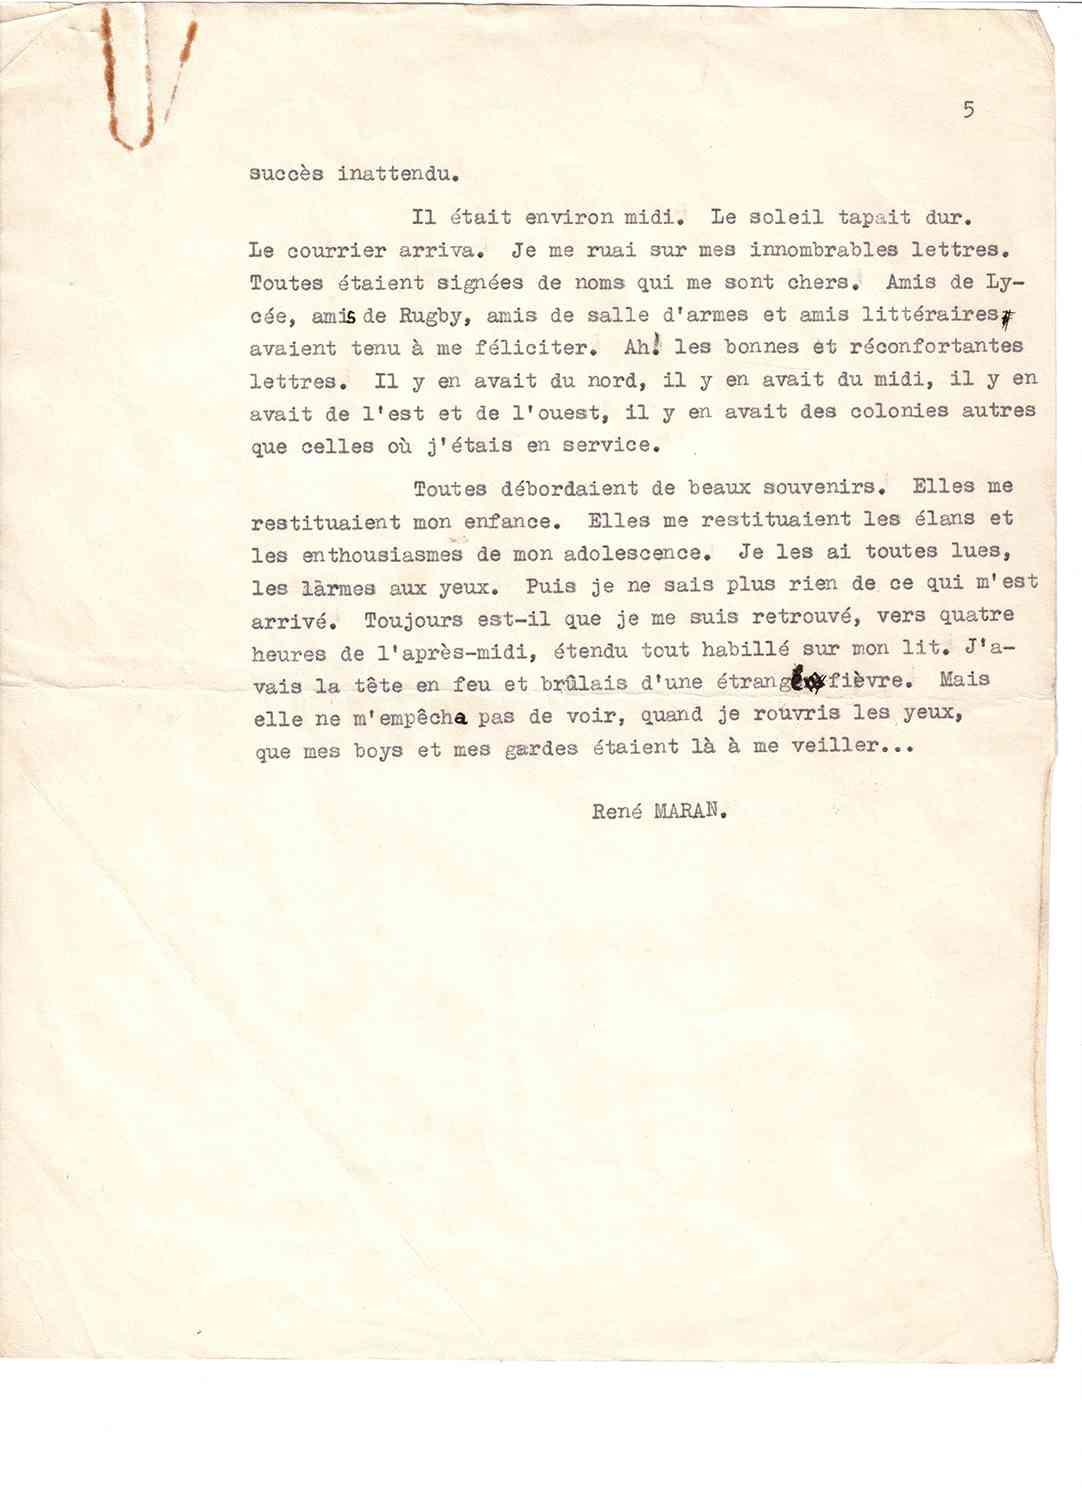 Causerie Page 5 Fin, René Maran